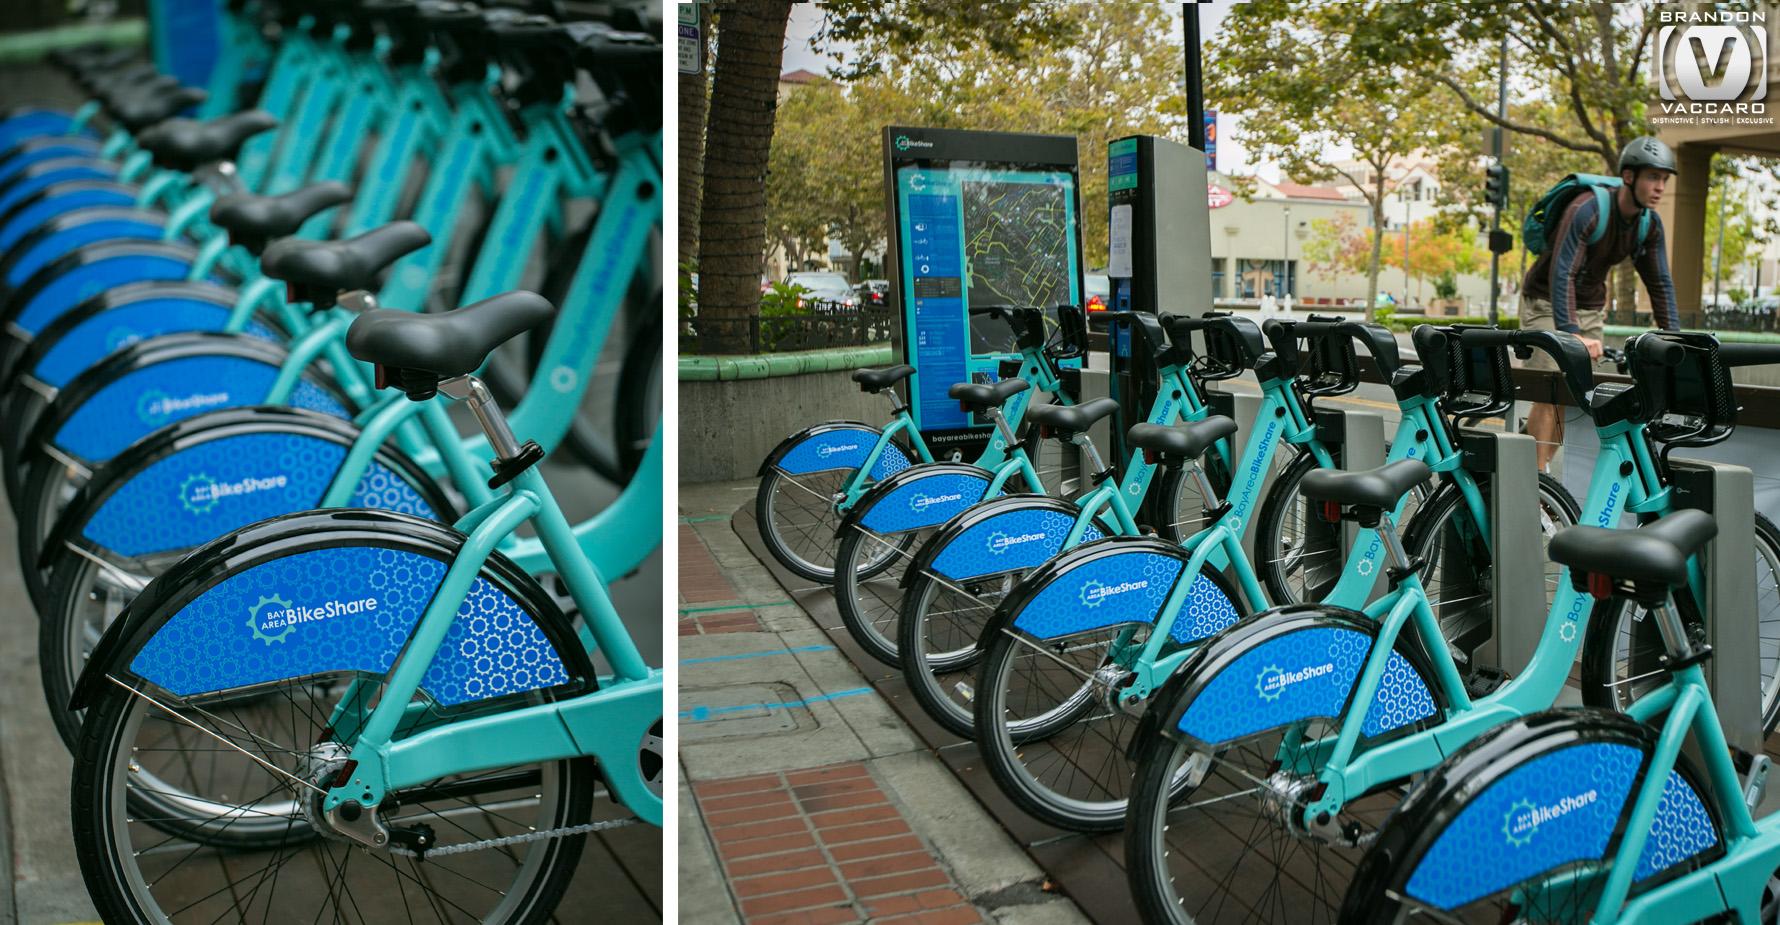 commercial-corporate-bay-area-bike-share-city-of-palo-alto.jpg